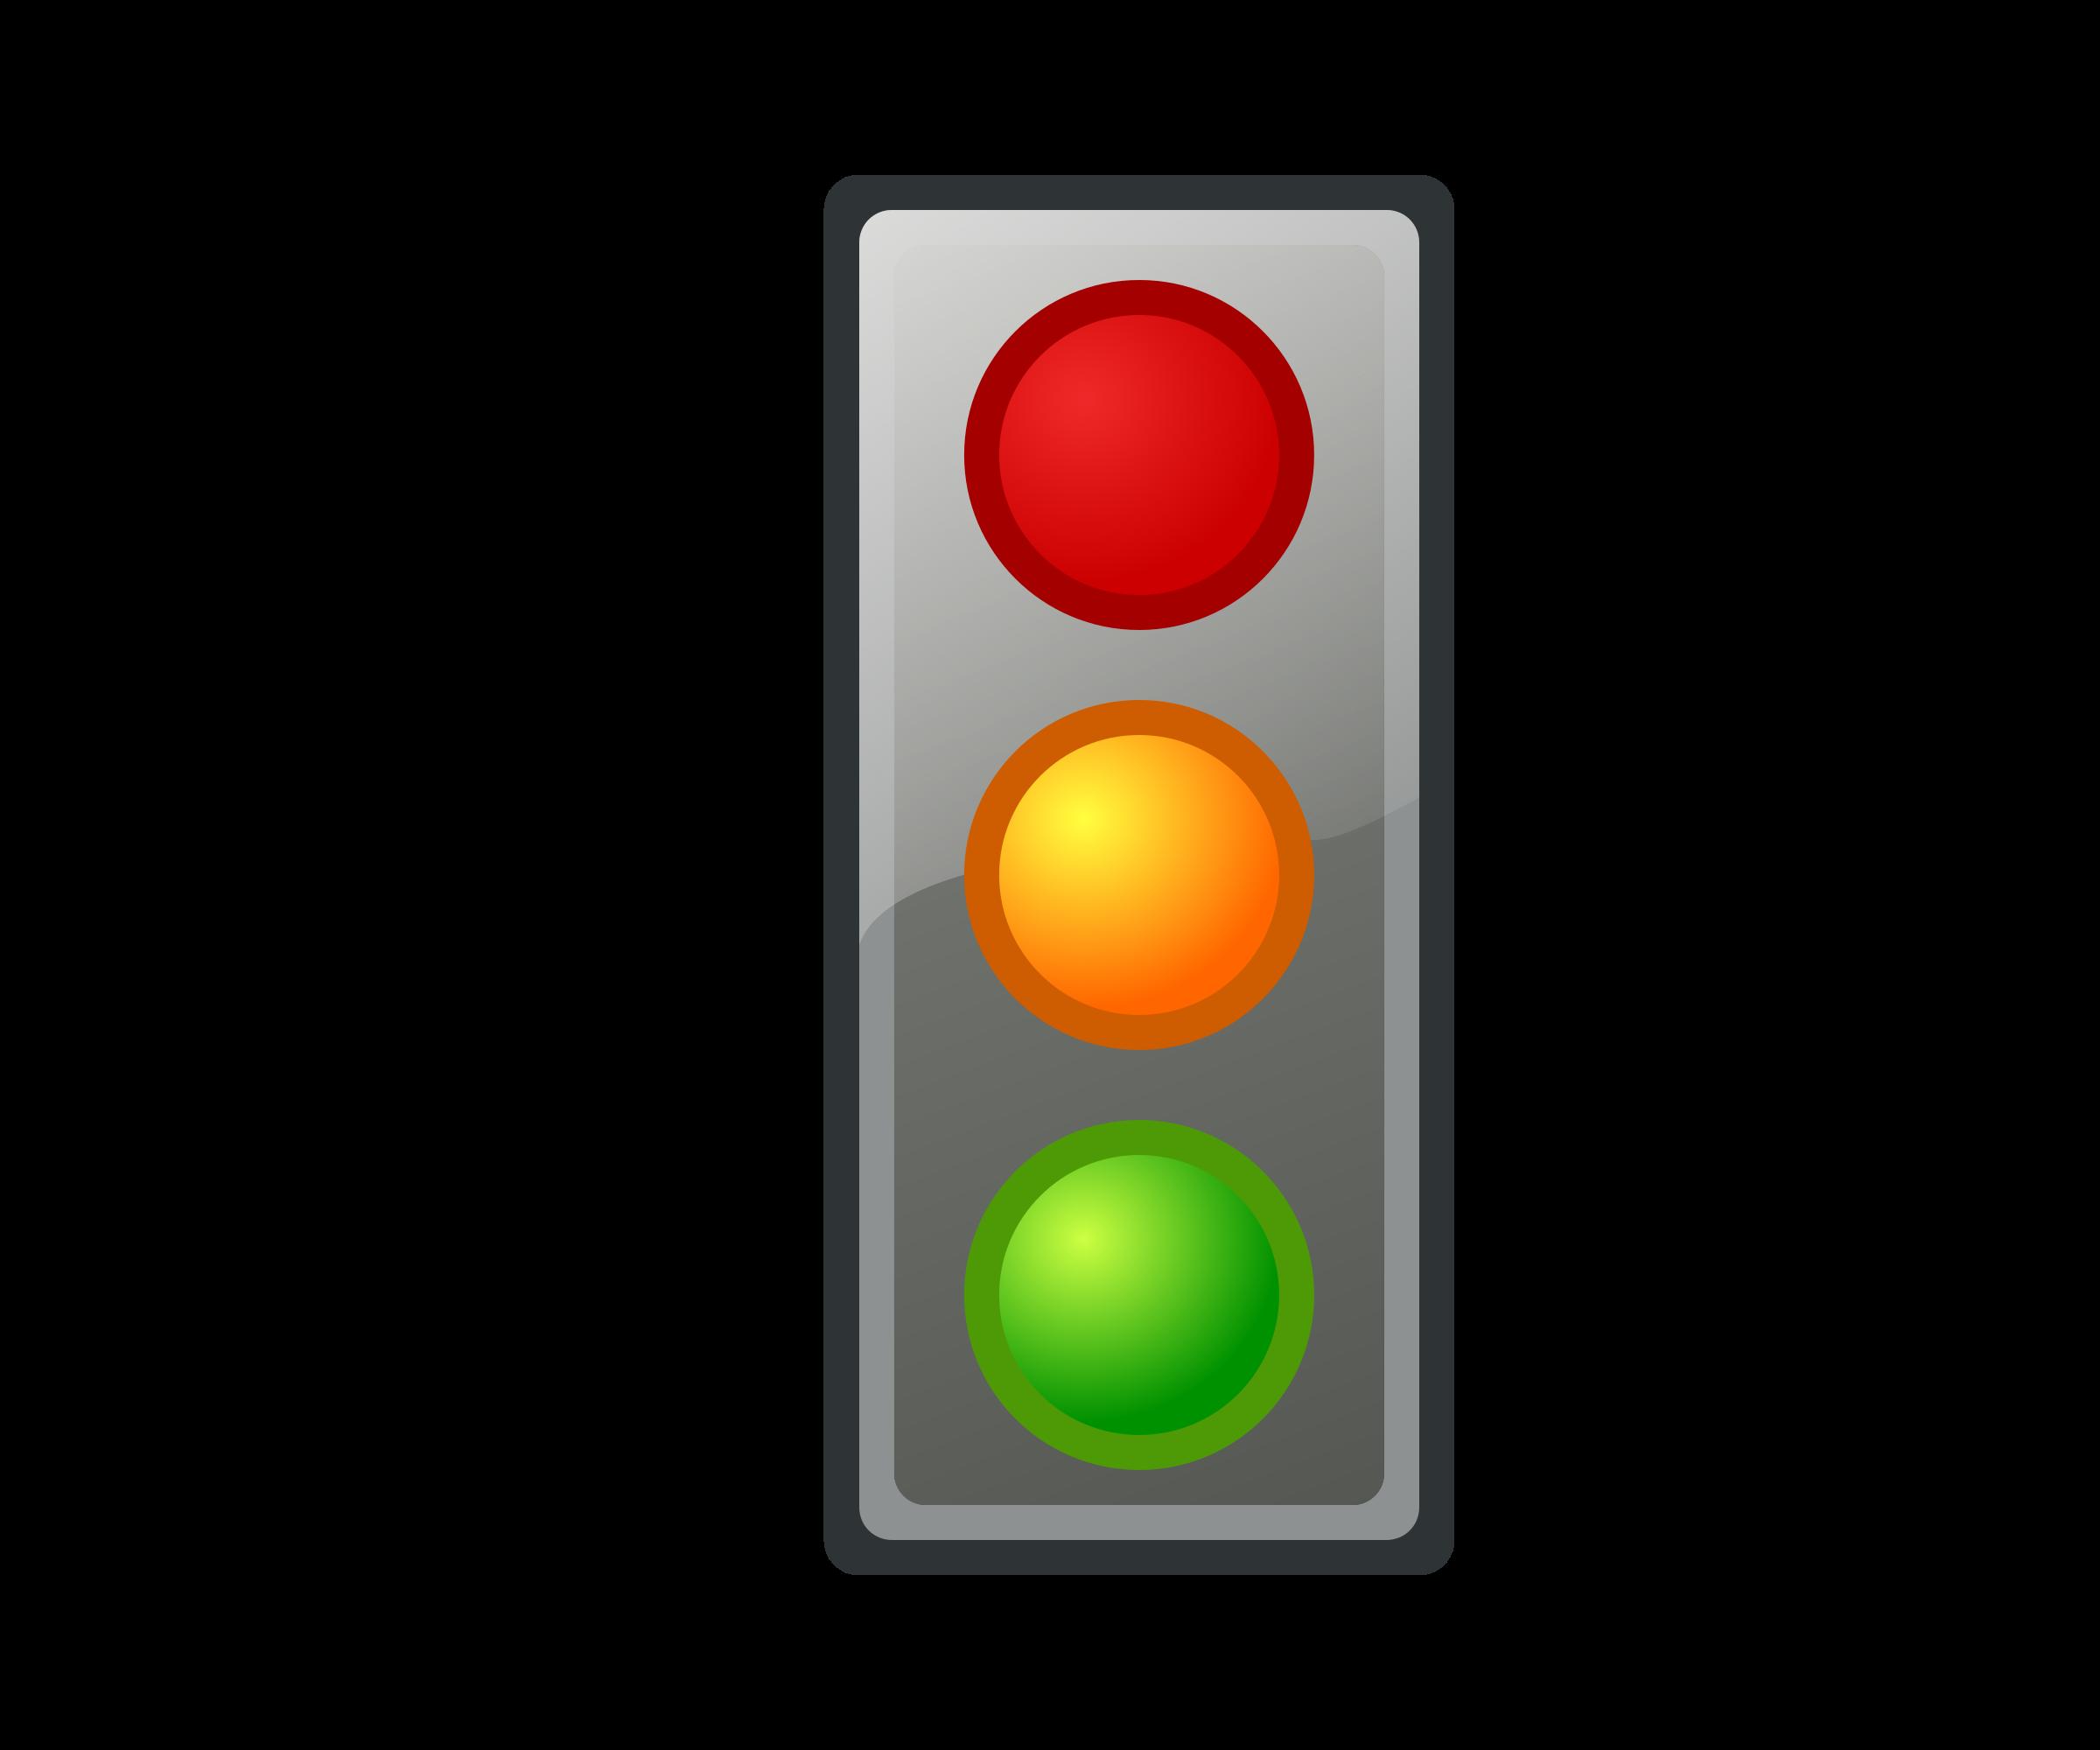 Stop Slow Go Traffic Light Png 2400 2000 Traffic Light Sign Traffic Light Light Activities